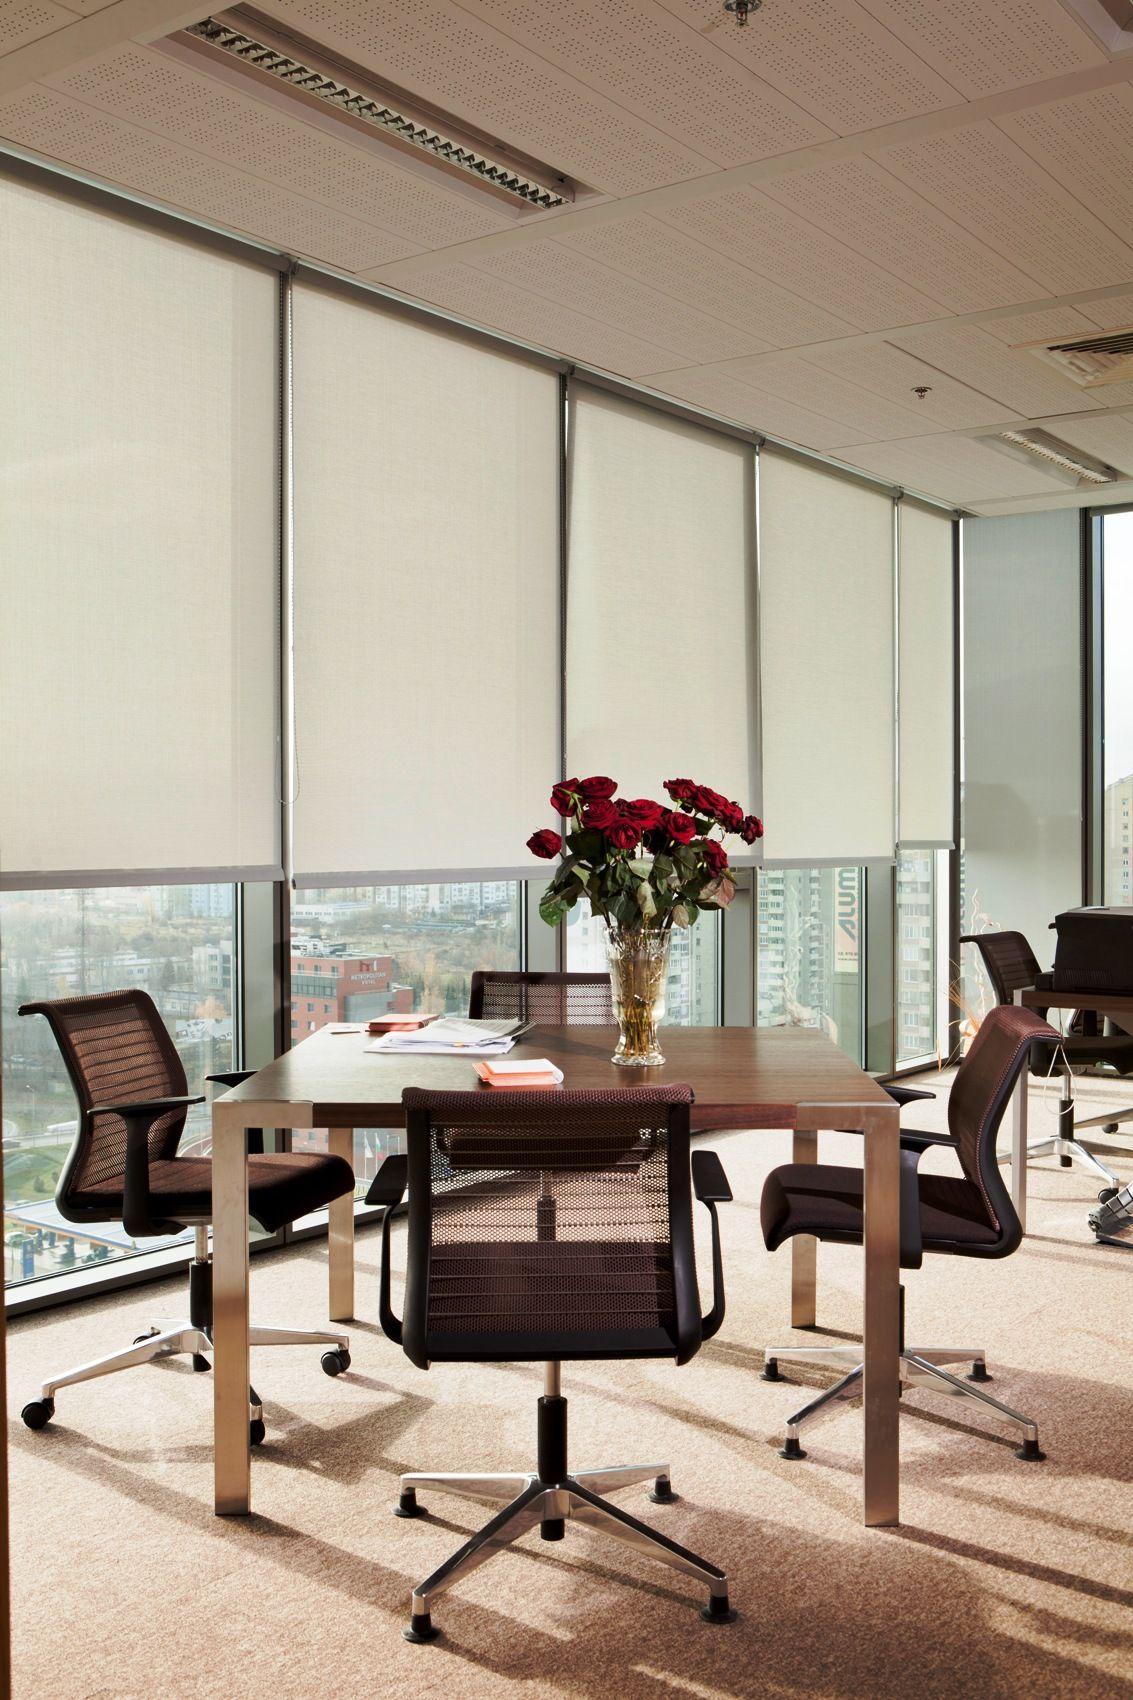 vivacom manager office office interior design sofia office